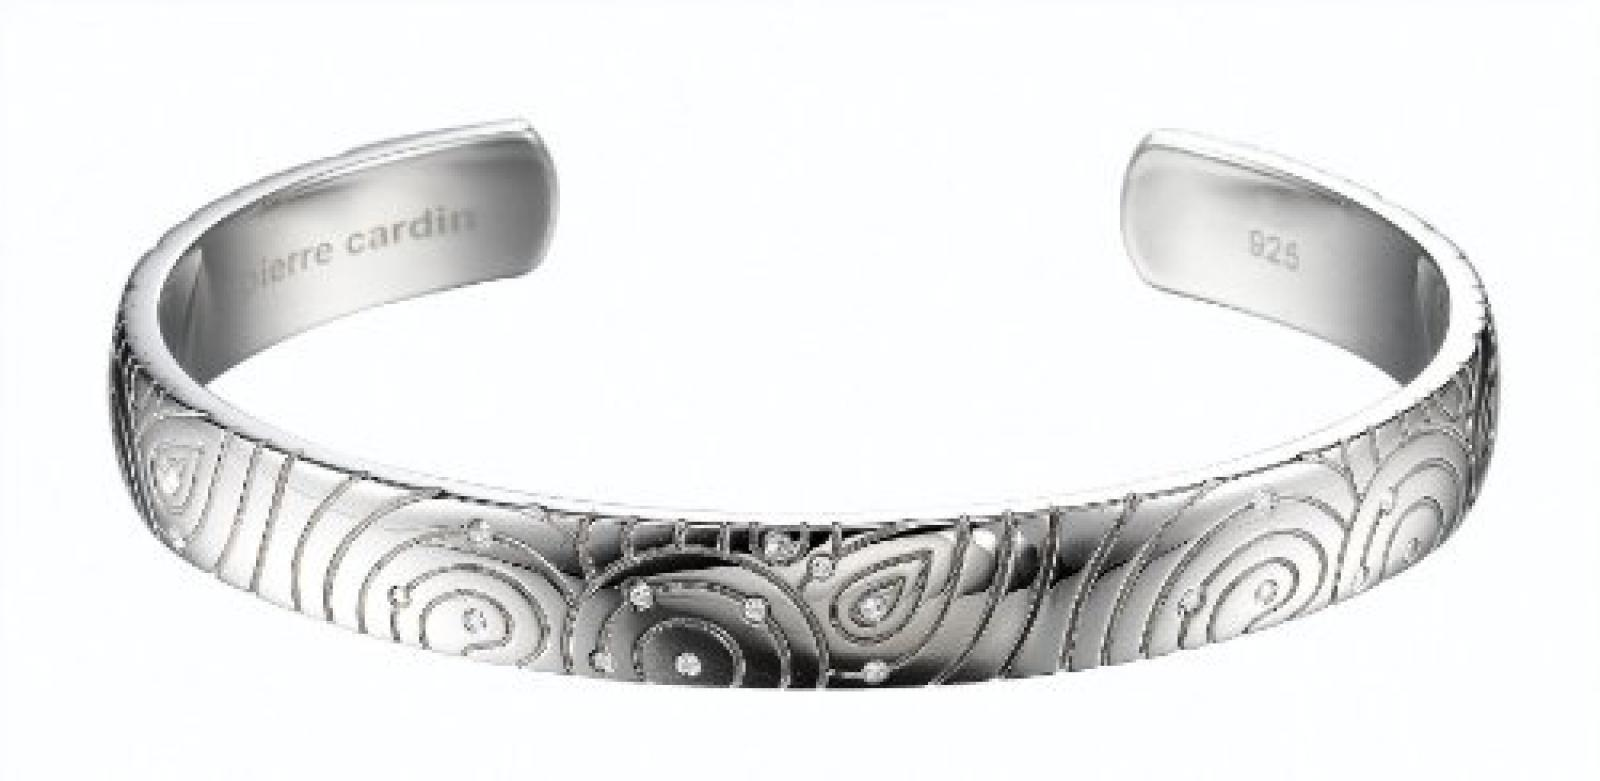 Pierre Cardin Damen-Armband Dedale Sineuse Sterling-Silber 925 60 Millimeters PCBA-90036.A.60